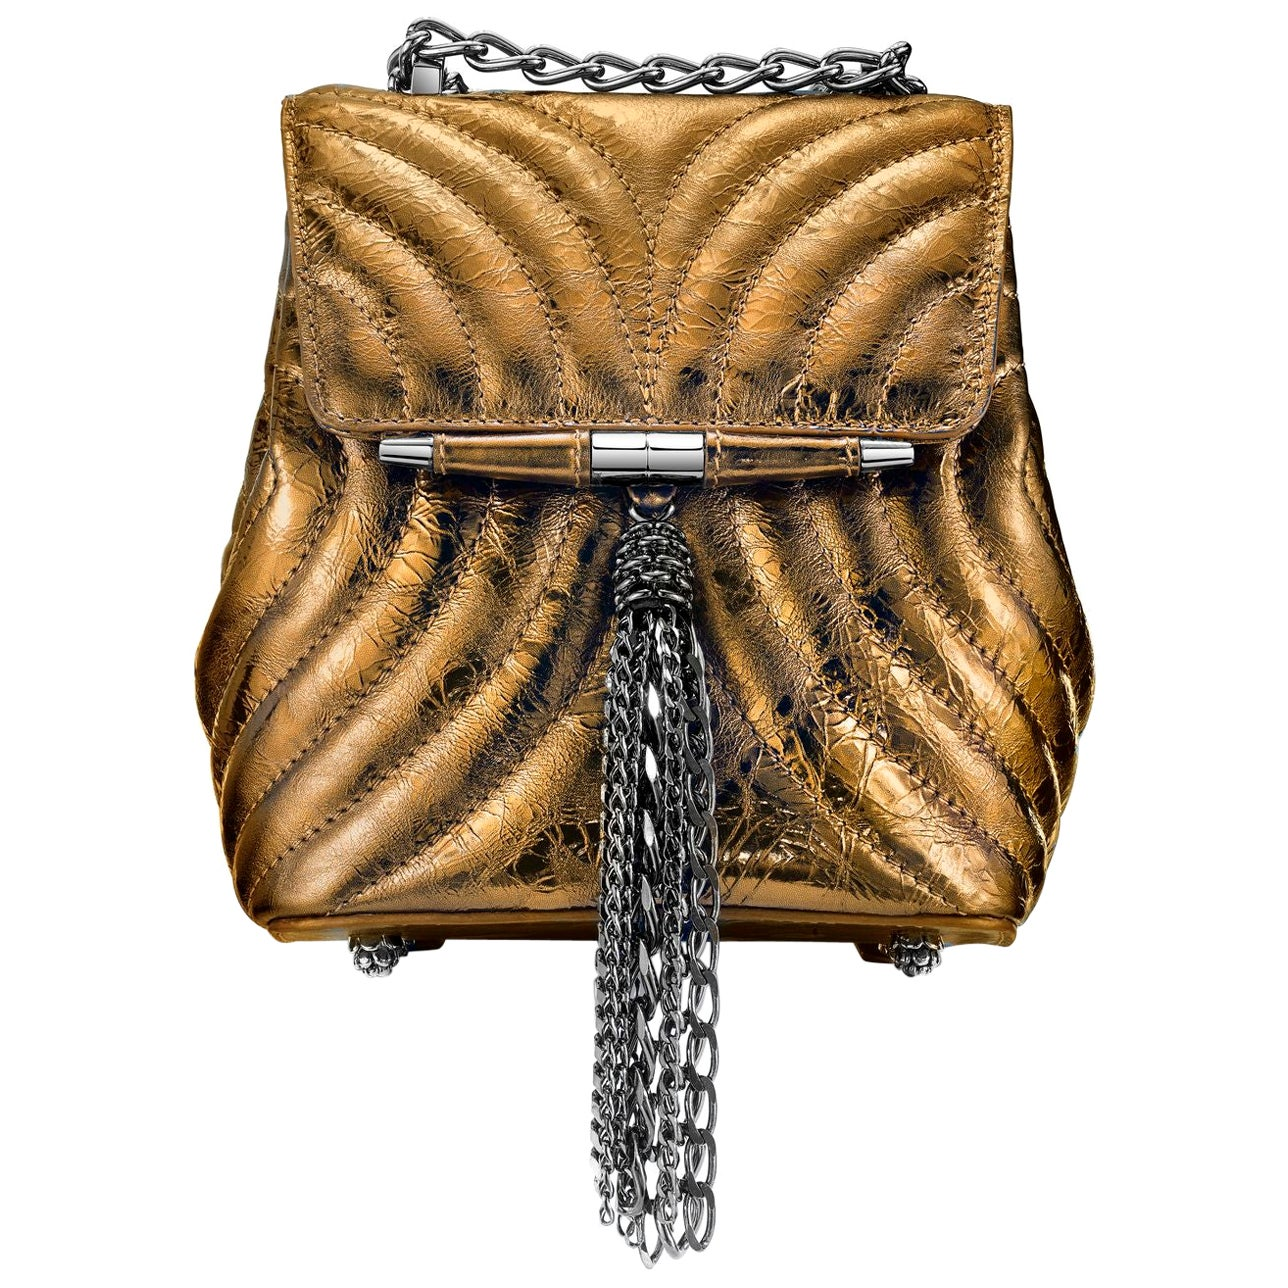 TYLER ELLIS Tiffany Backpack Petite in Bronze Leather with Gunmetal Hardware